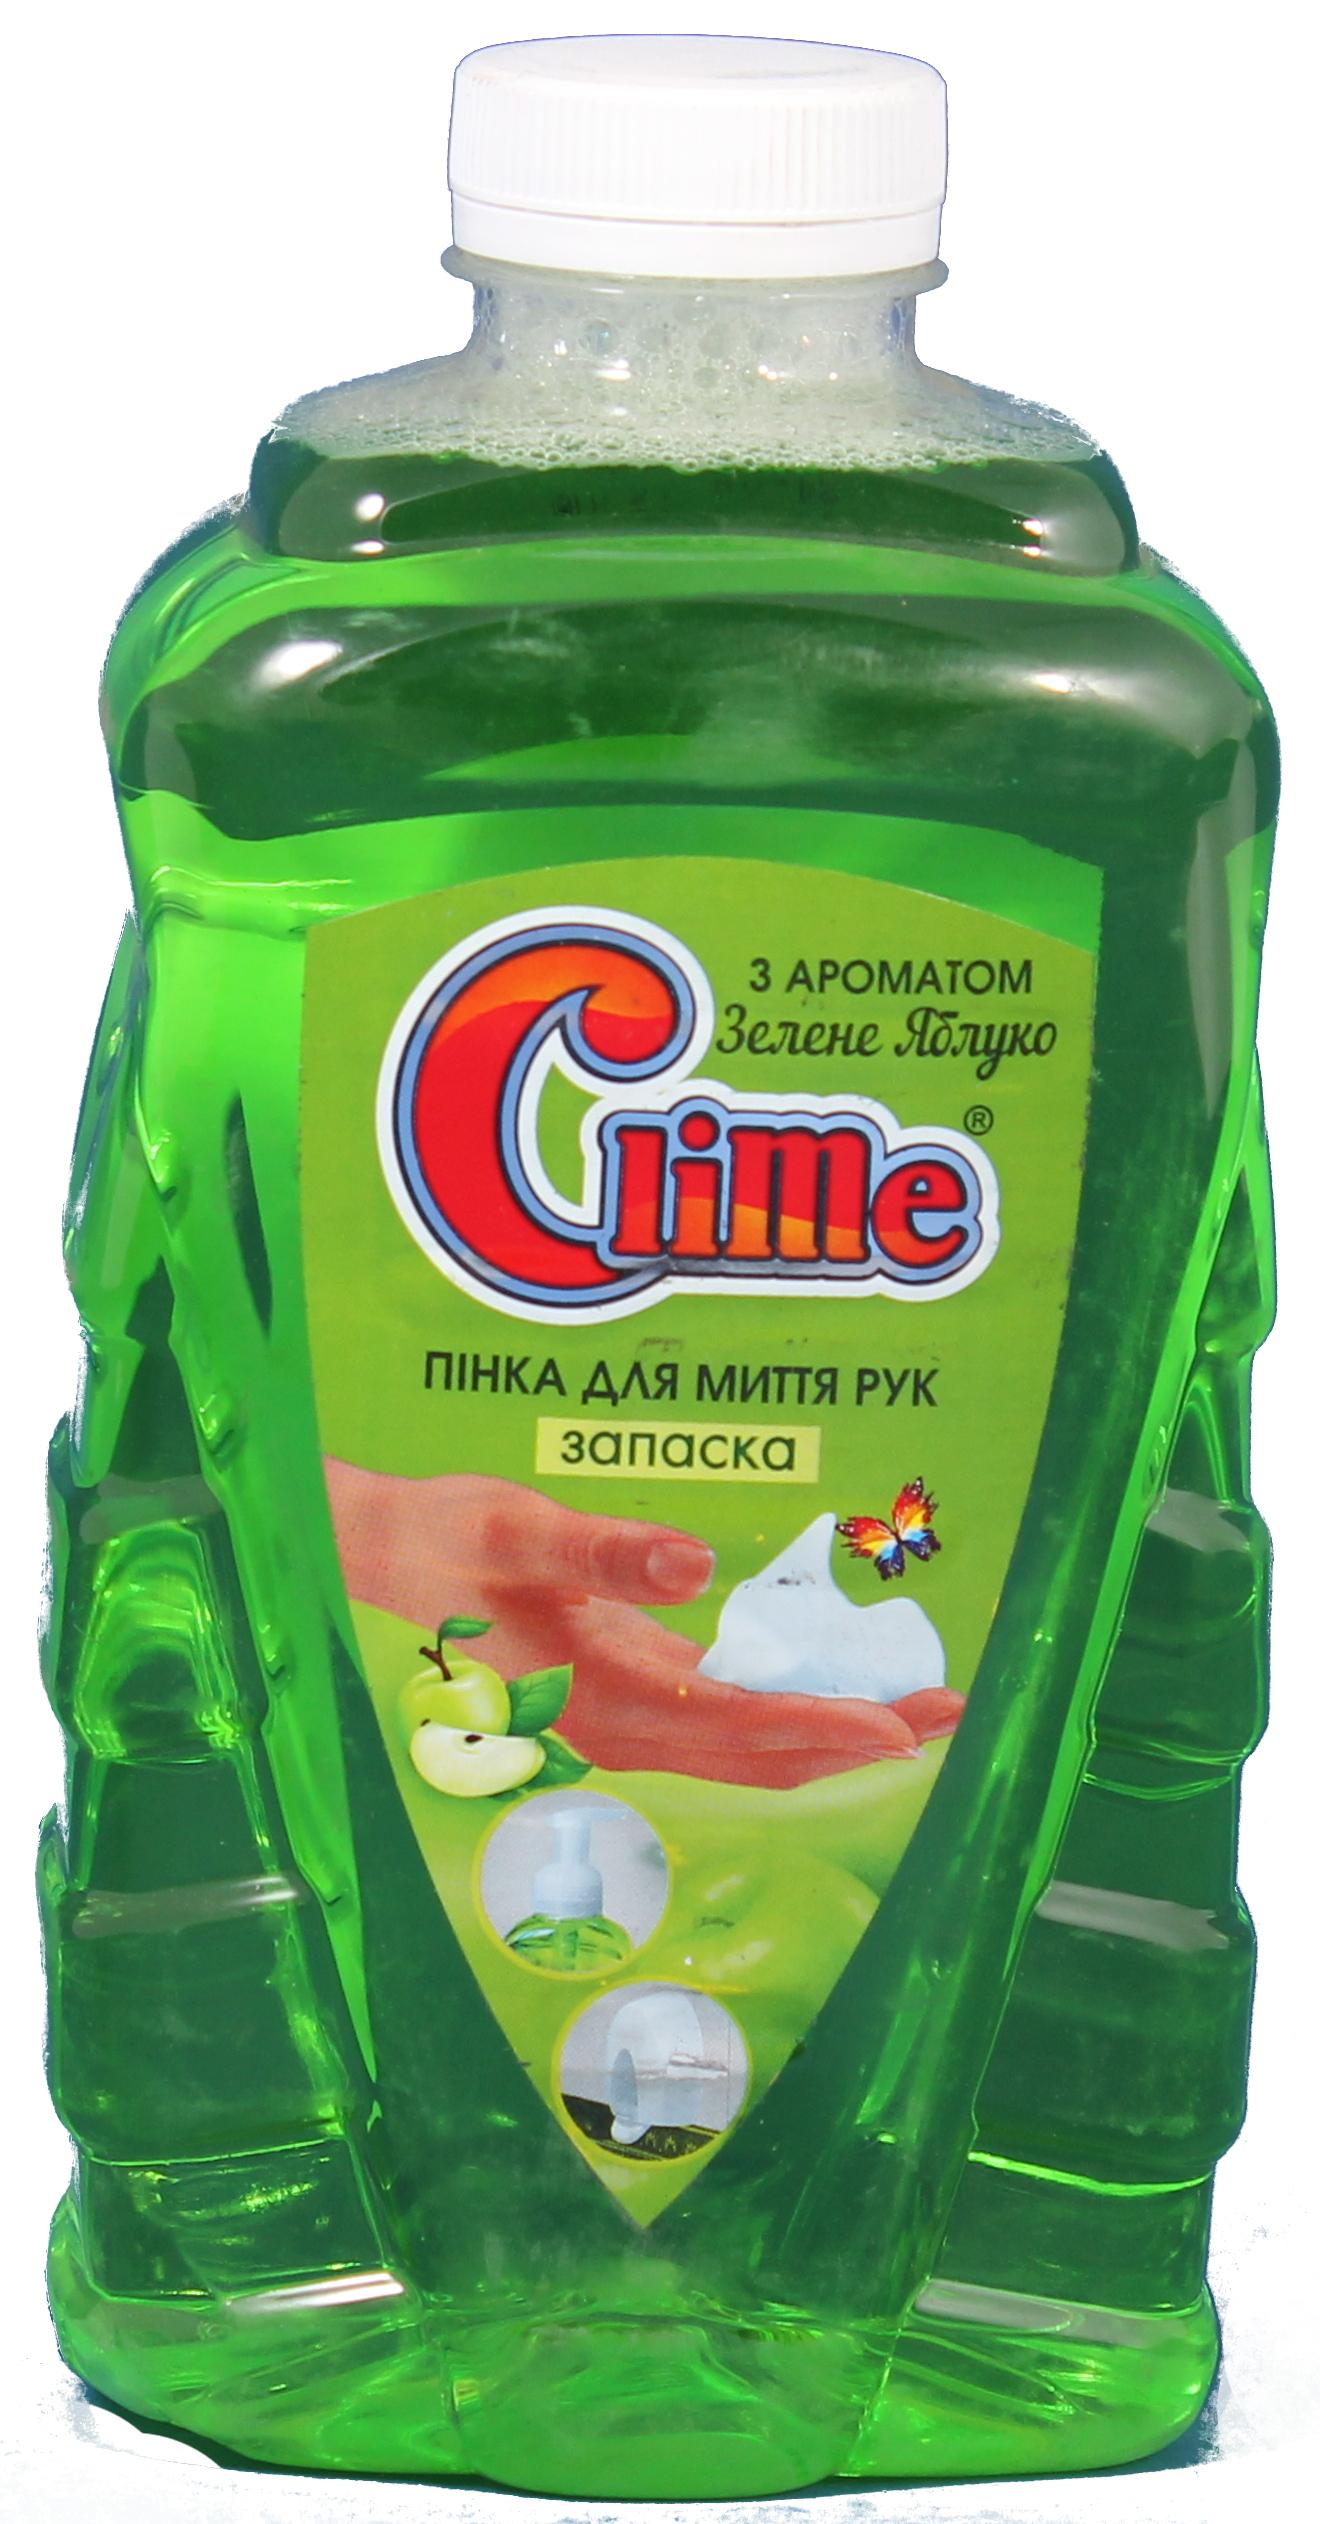 Clime Пінка для миття рук 1л Зел.яблуко PGA10 (запаска)